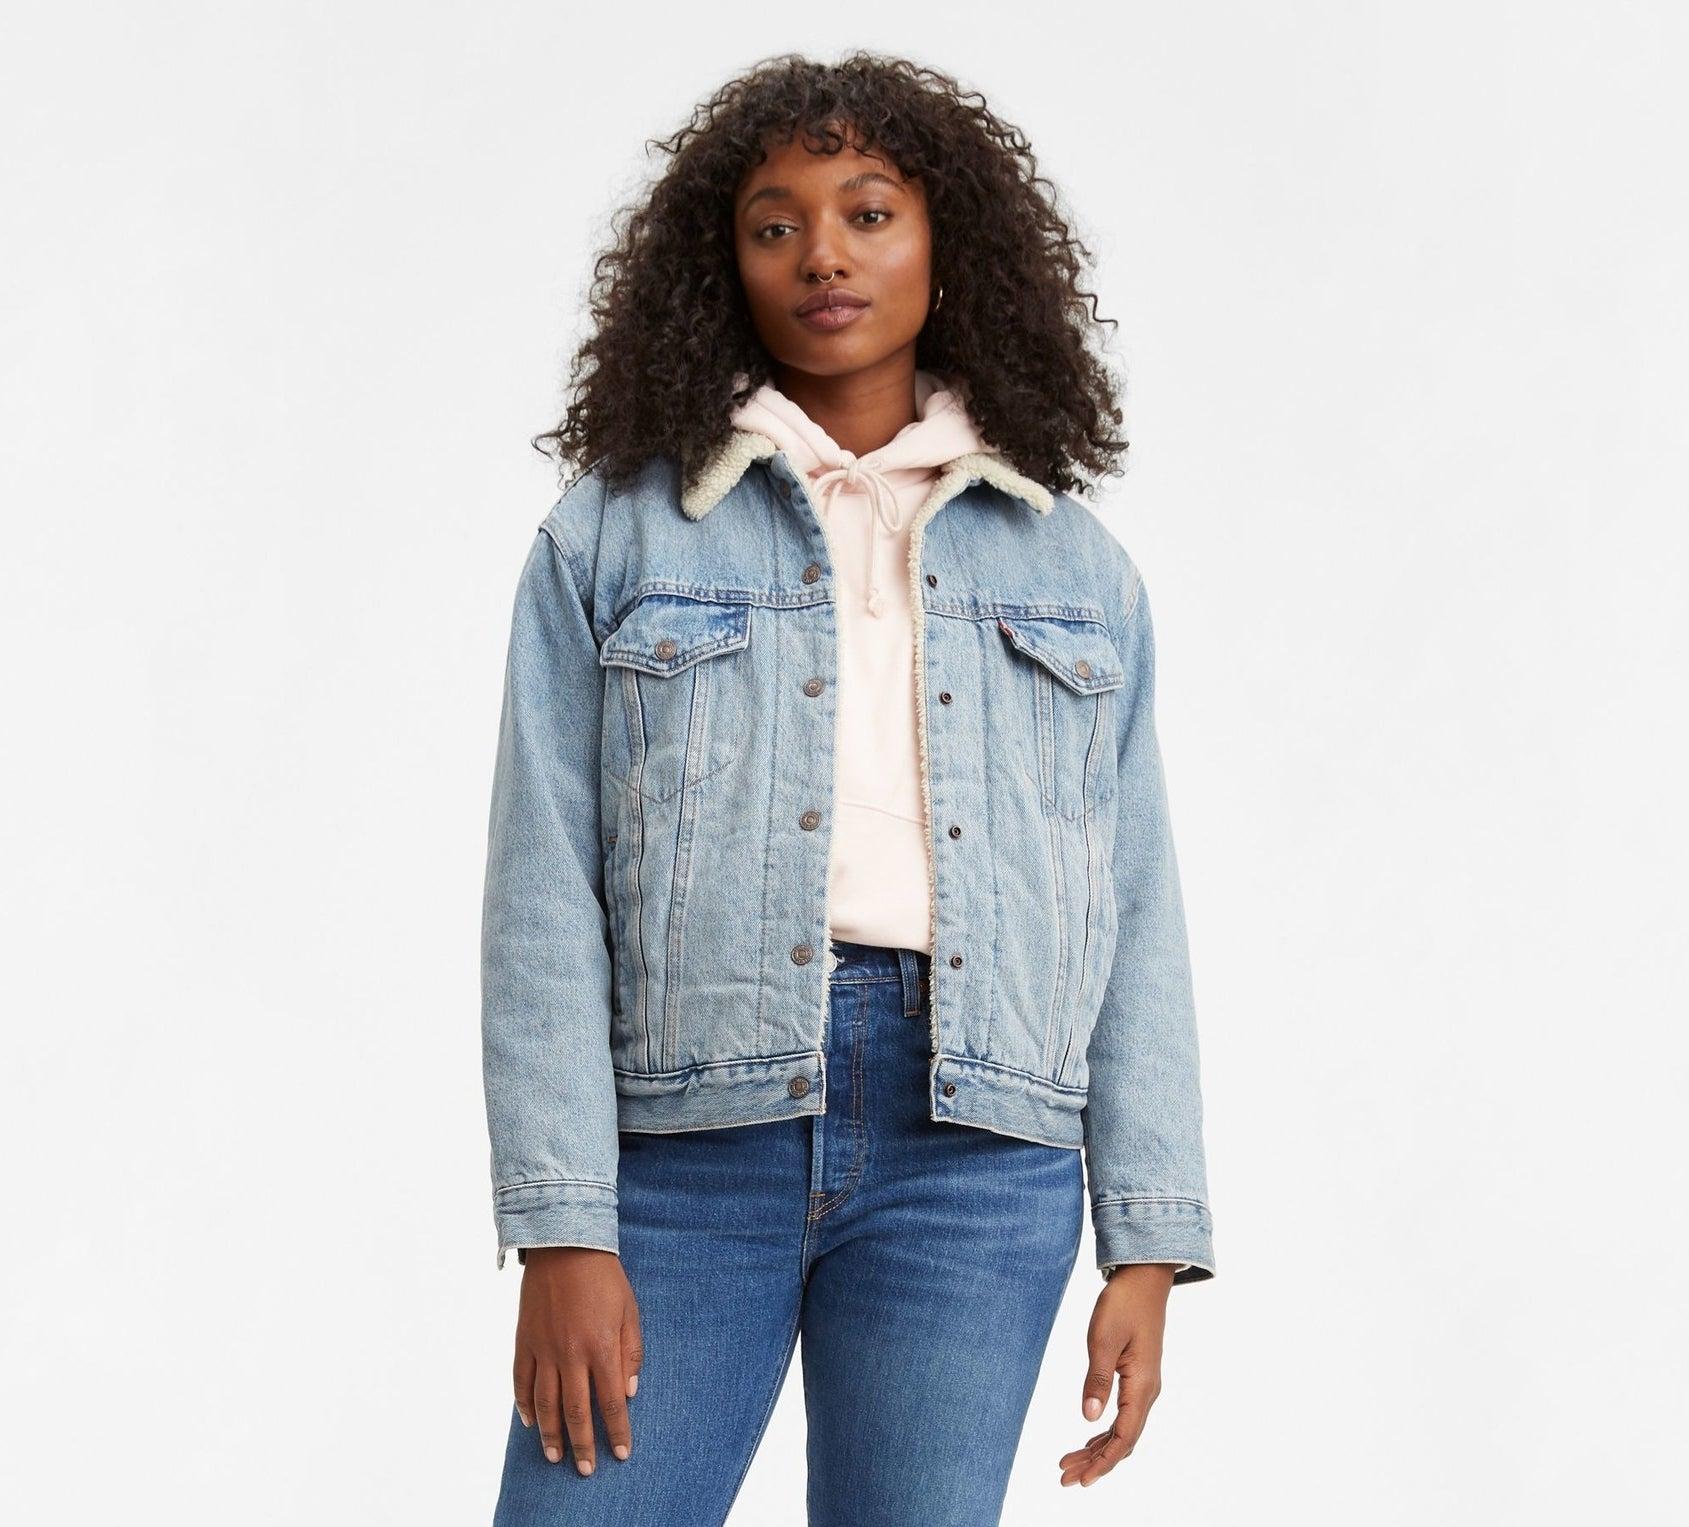 Model wearing the jacket in a light-wash denim